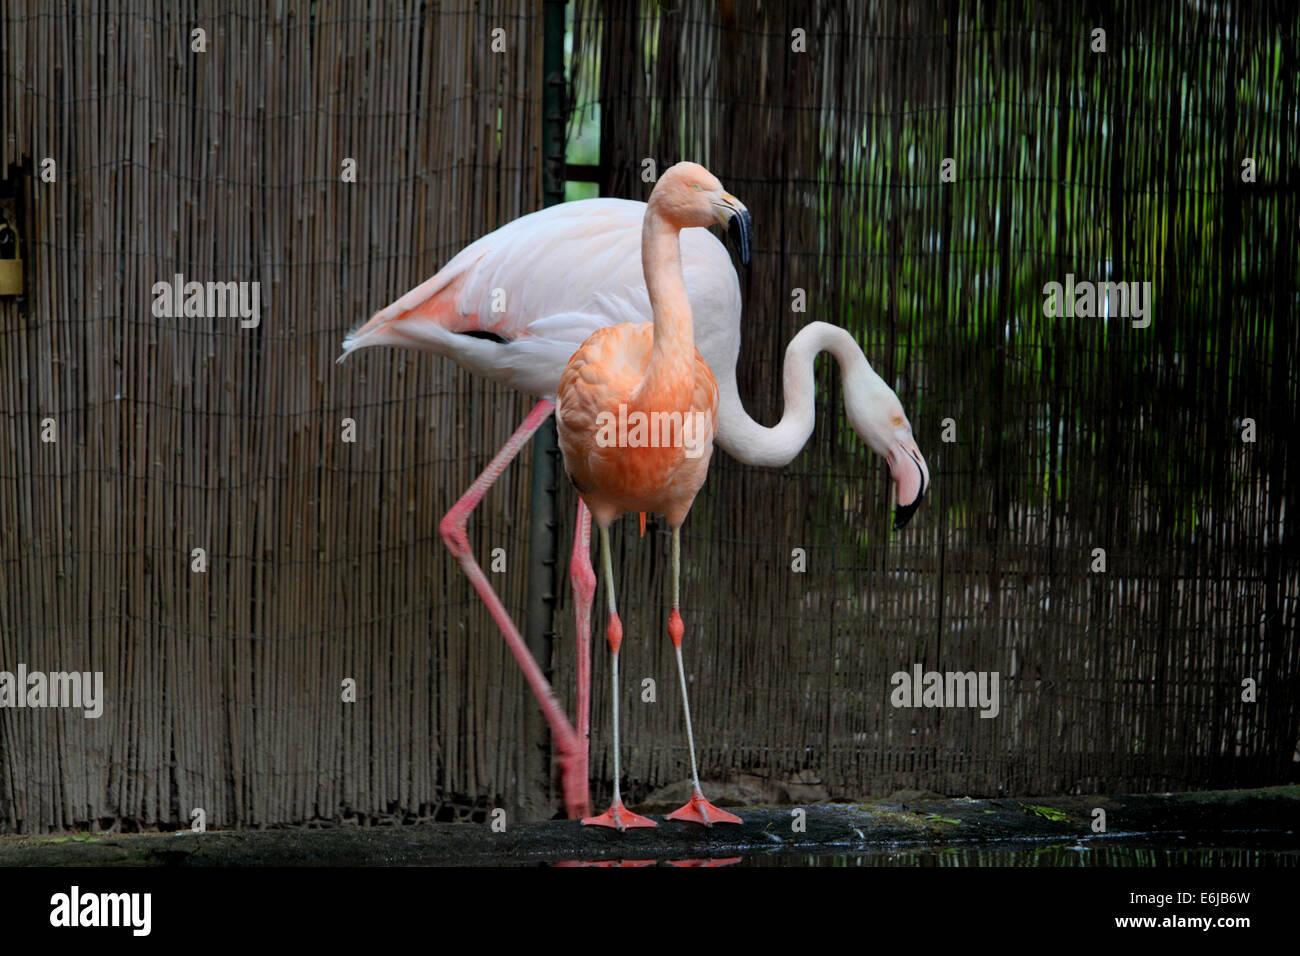 Two flamingos in Adelaide Zoo in Australia - Stock Image